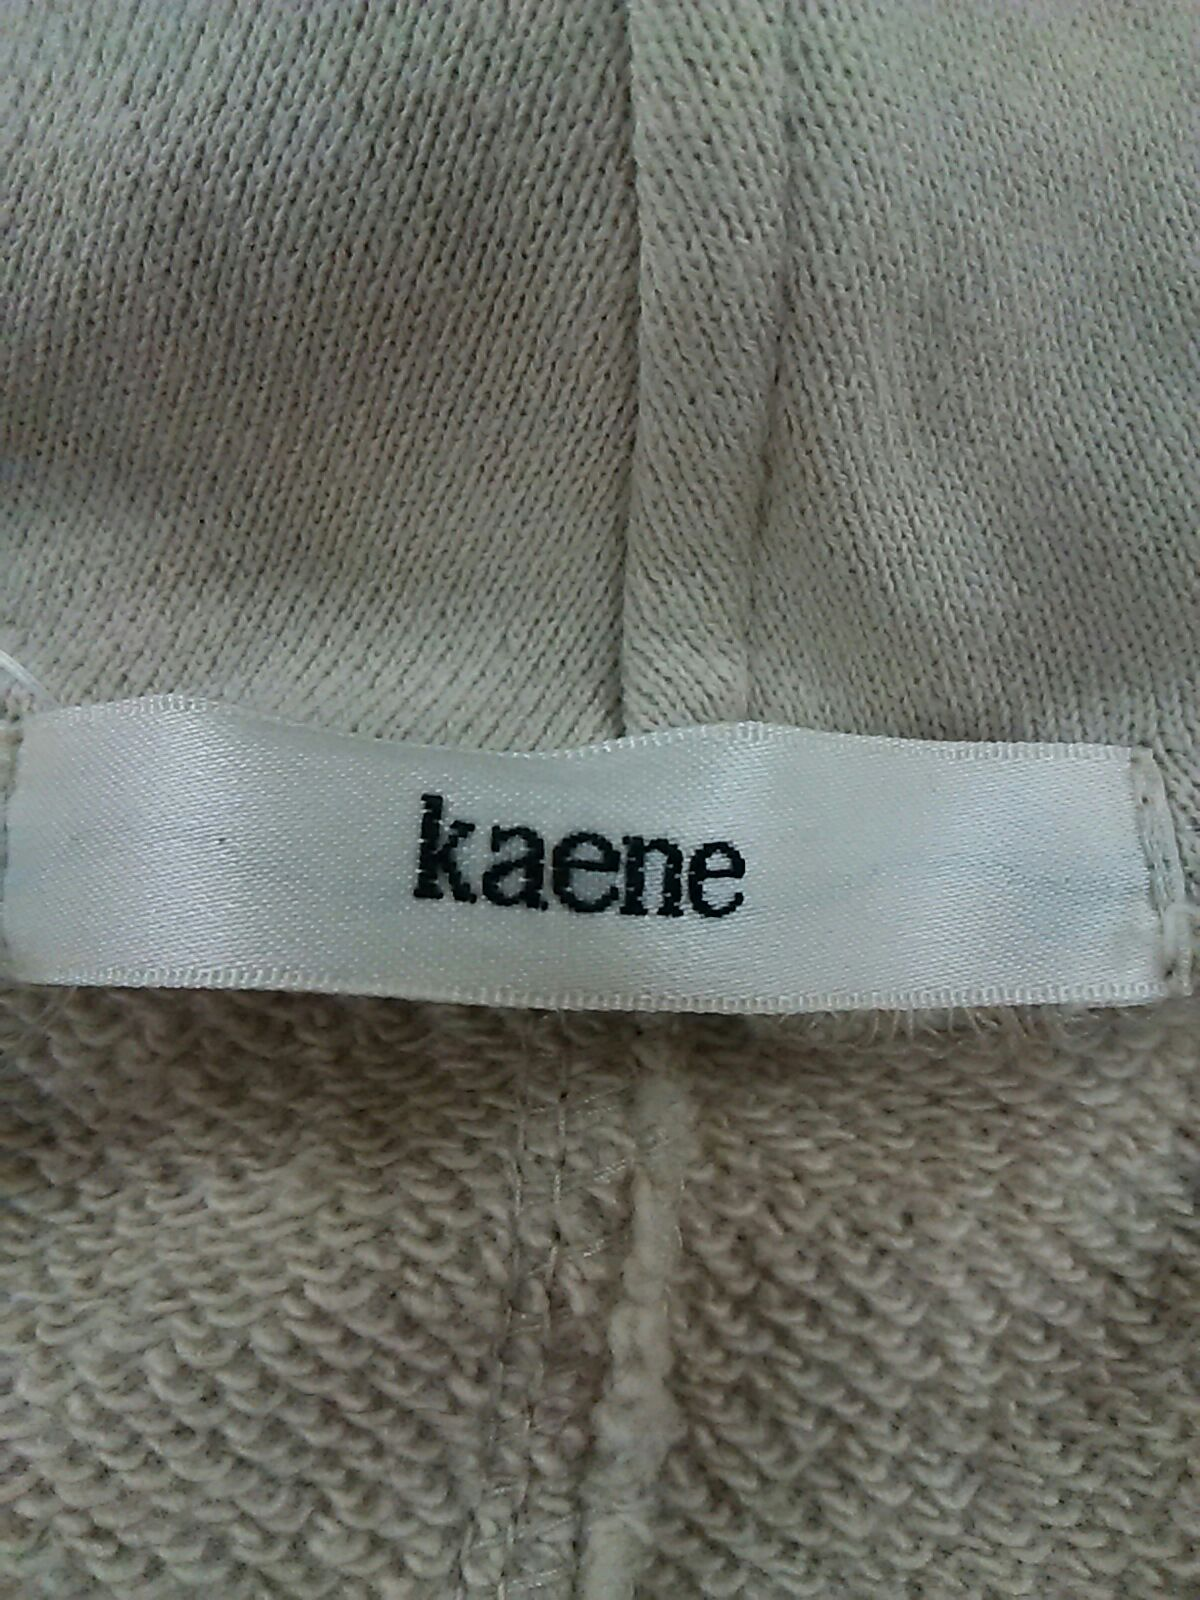 kaene(カエン)のパーカー